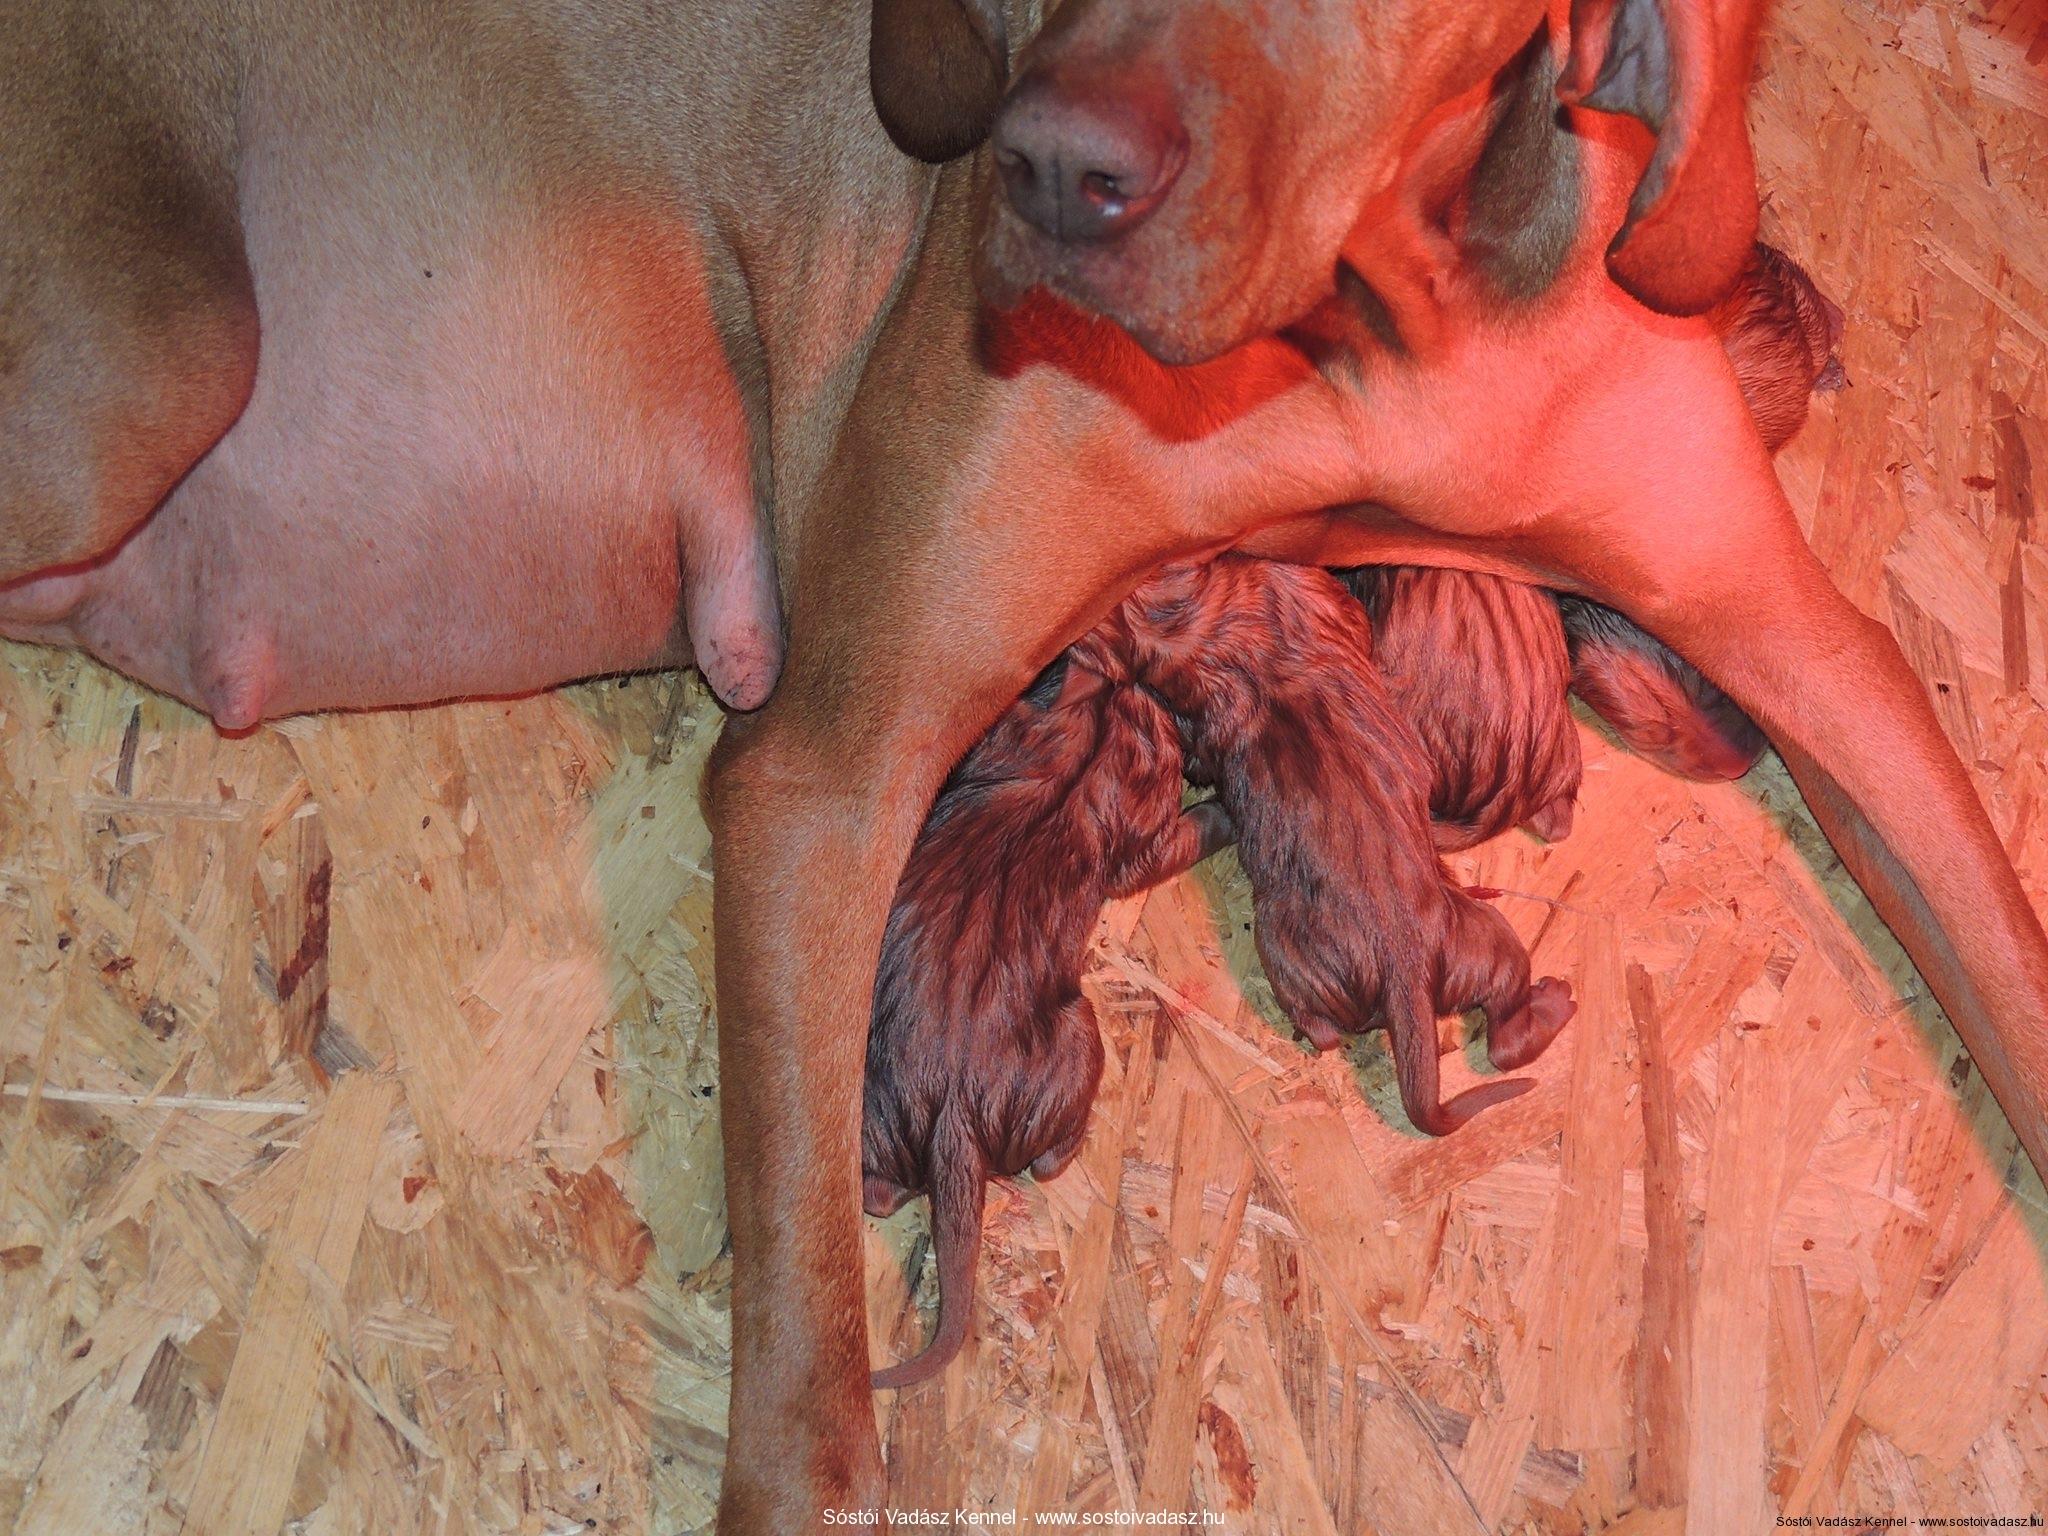 Female Vizsla Puppy Name Teca Hunting Black Truffles